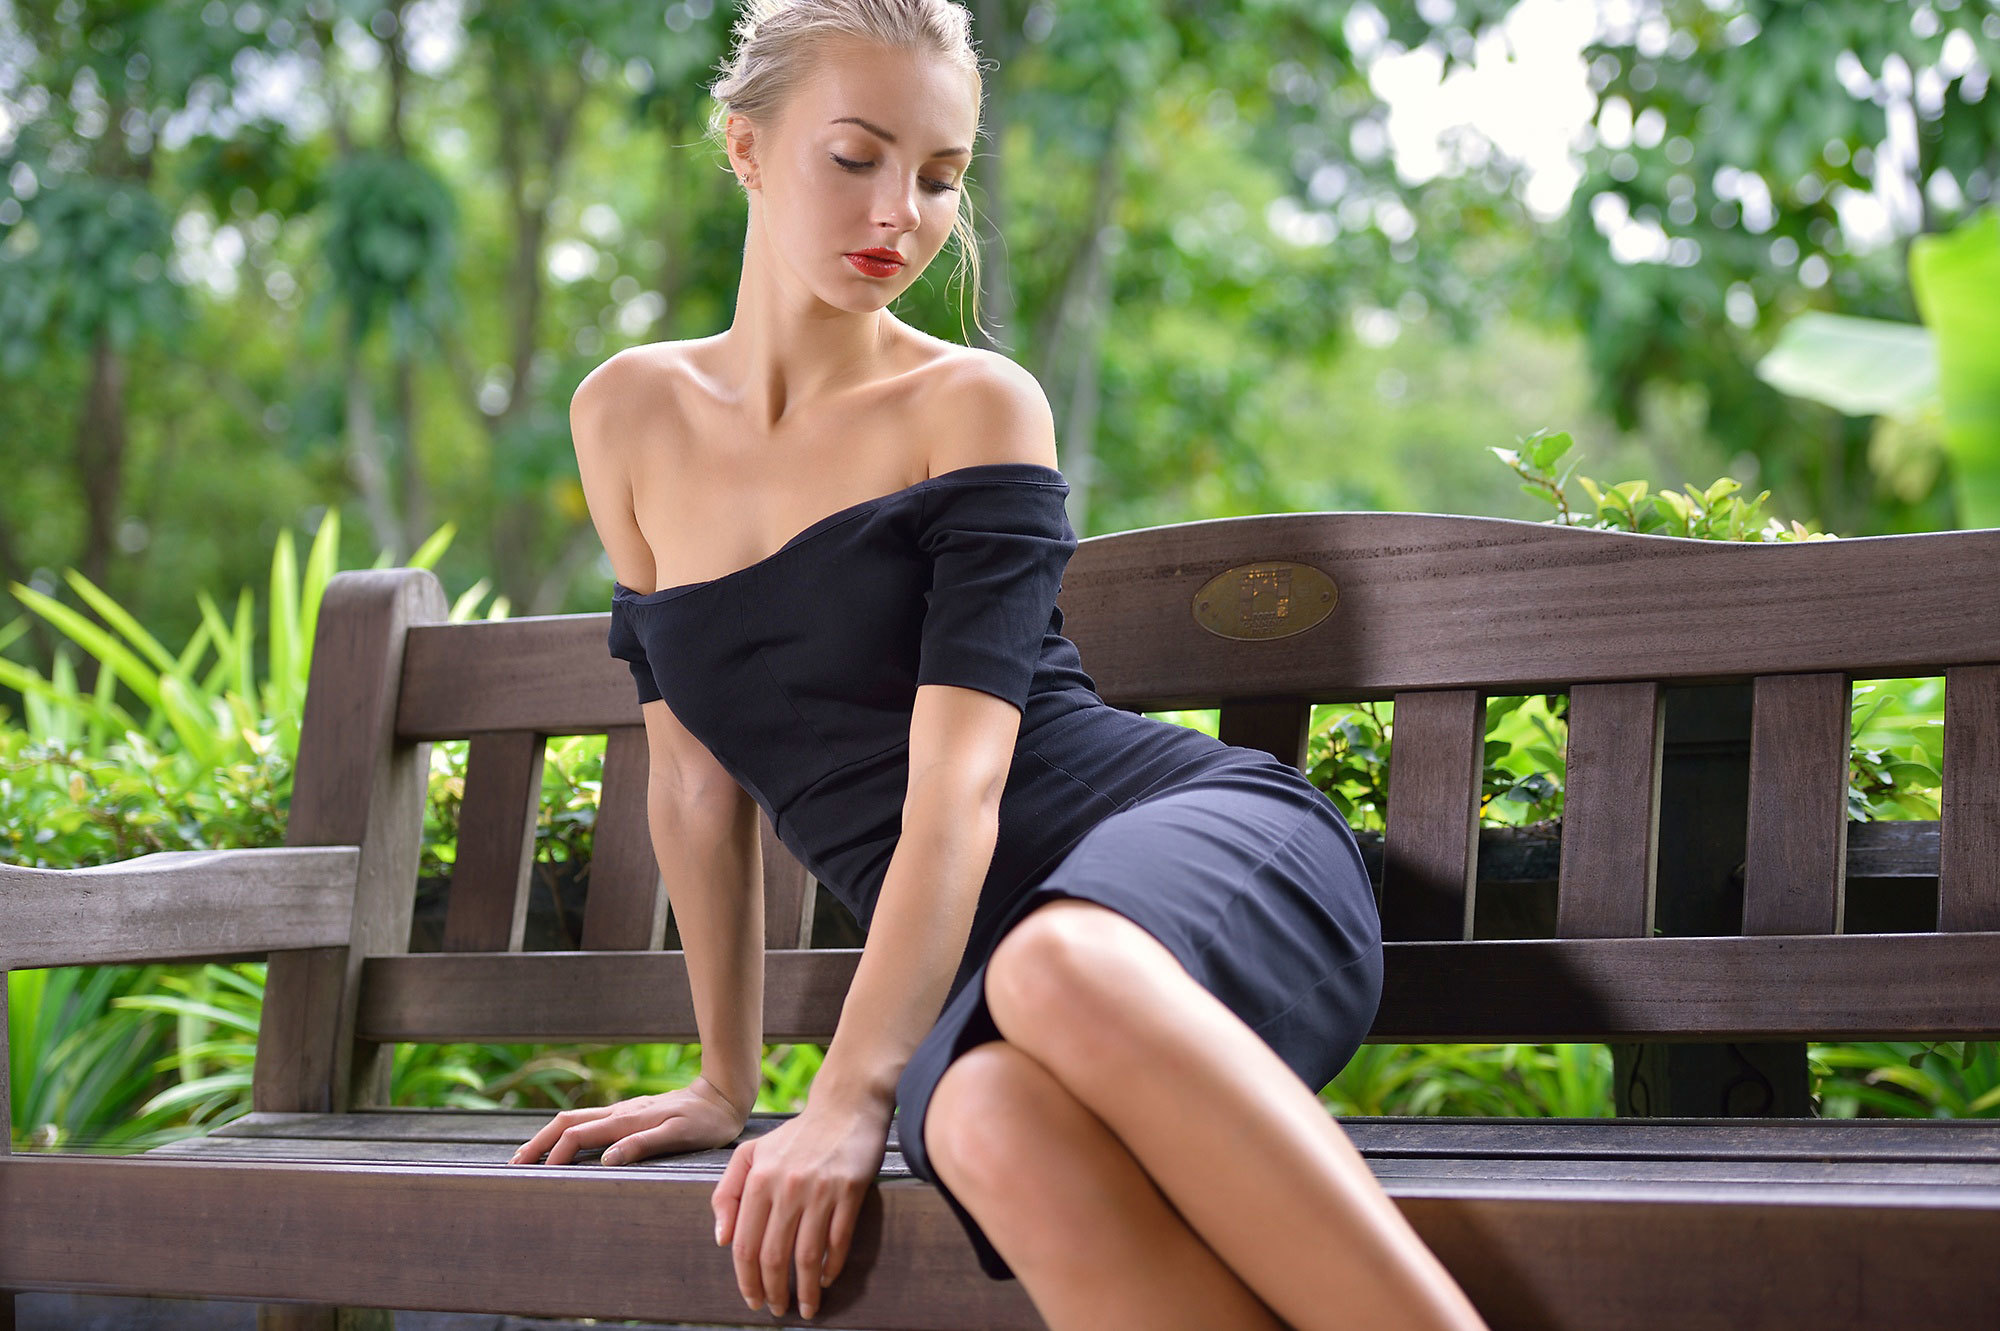 morgan-blonde-girls-dress